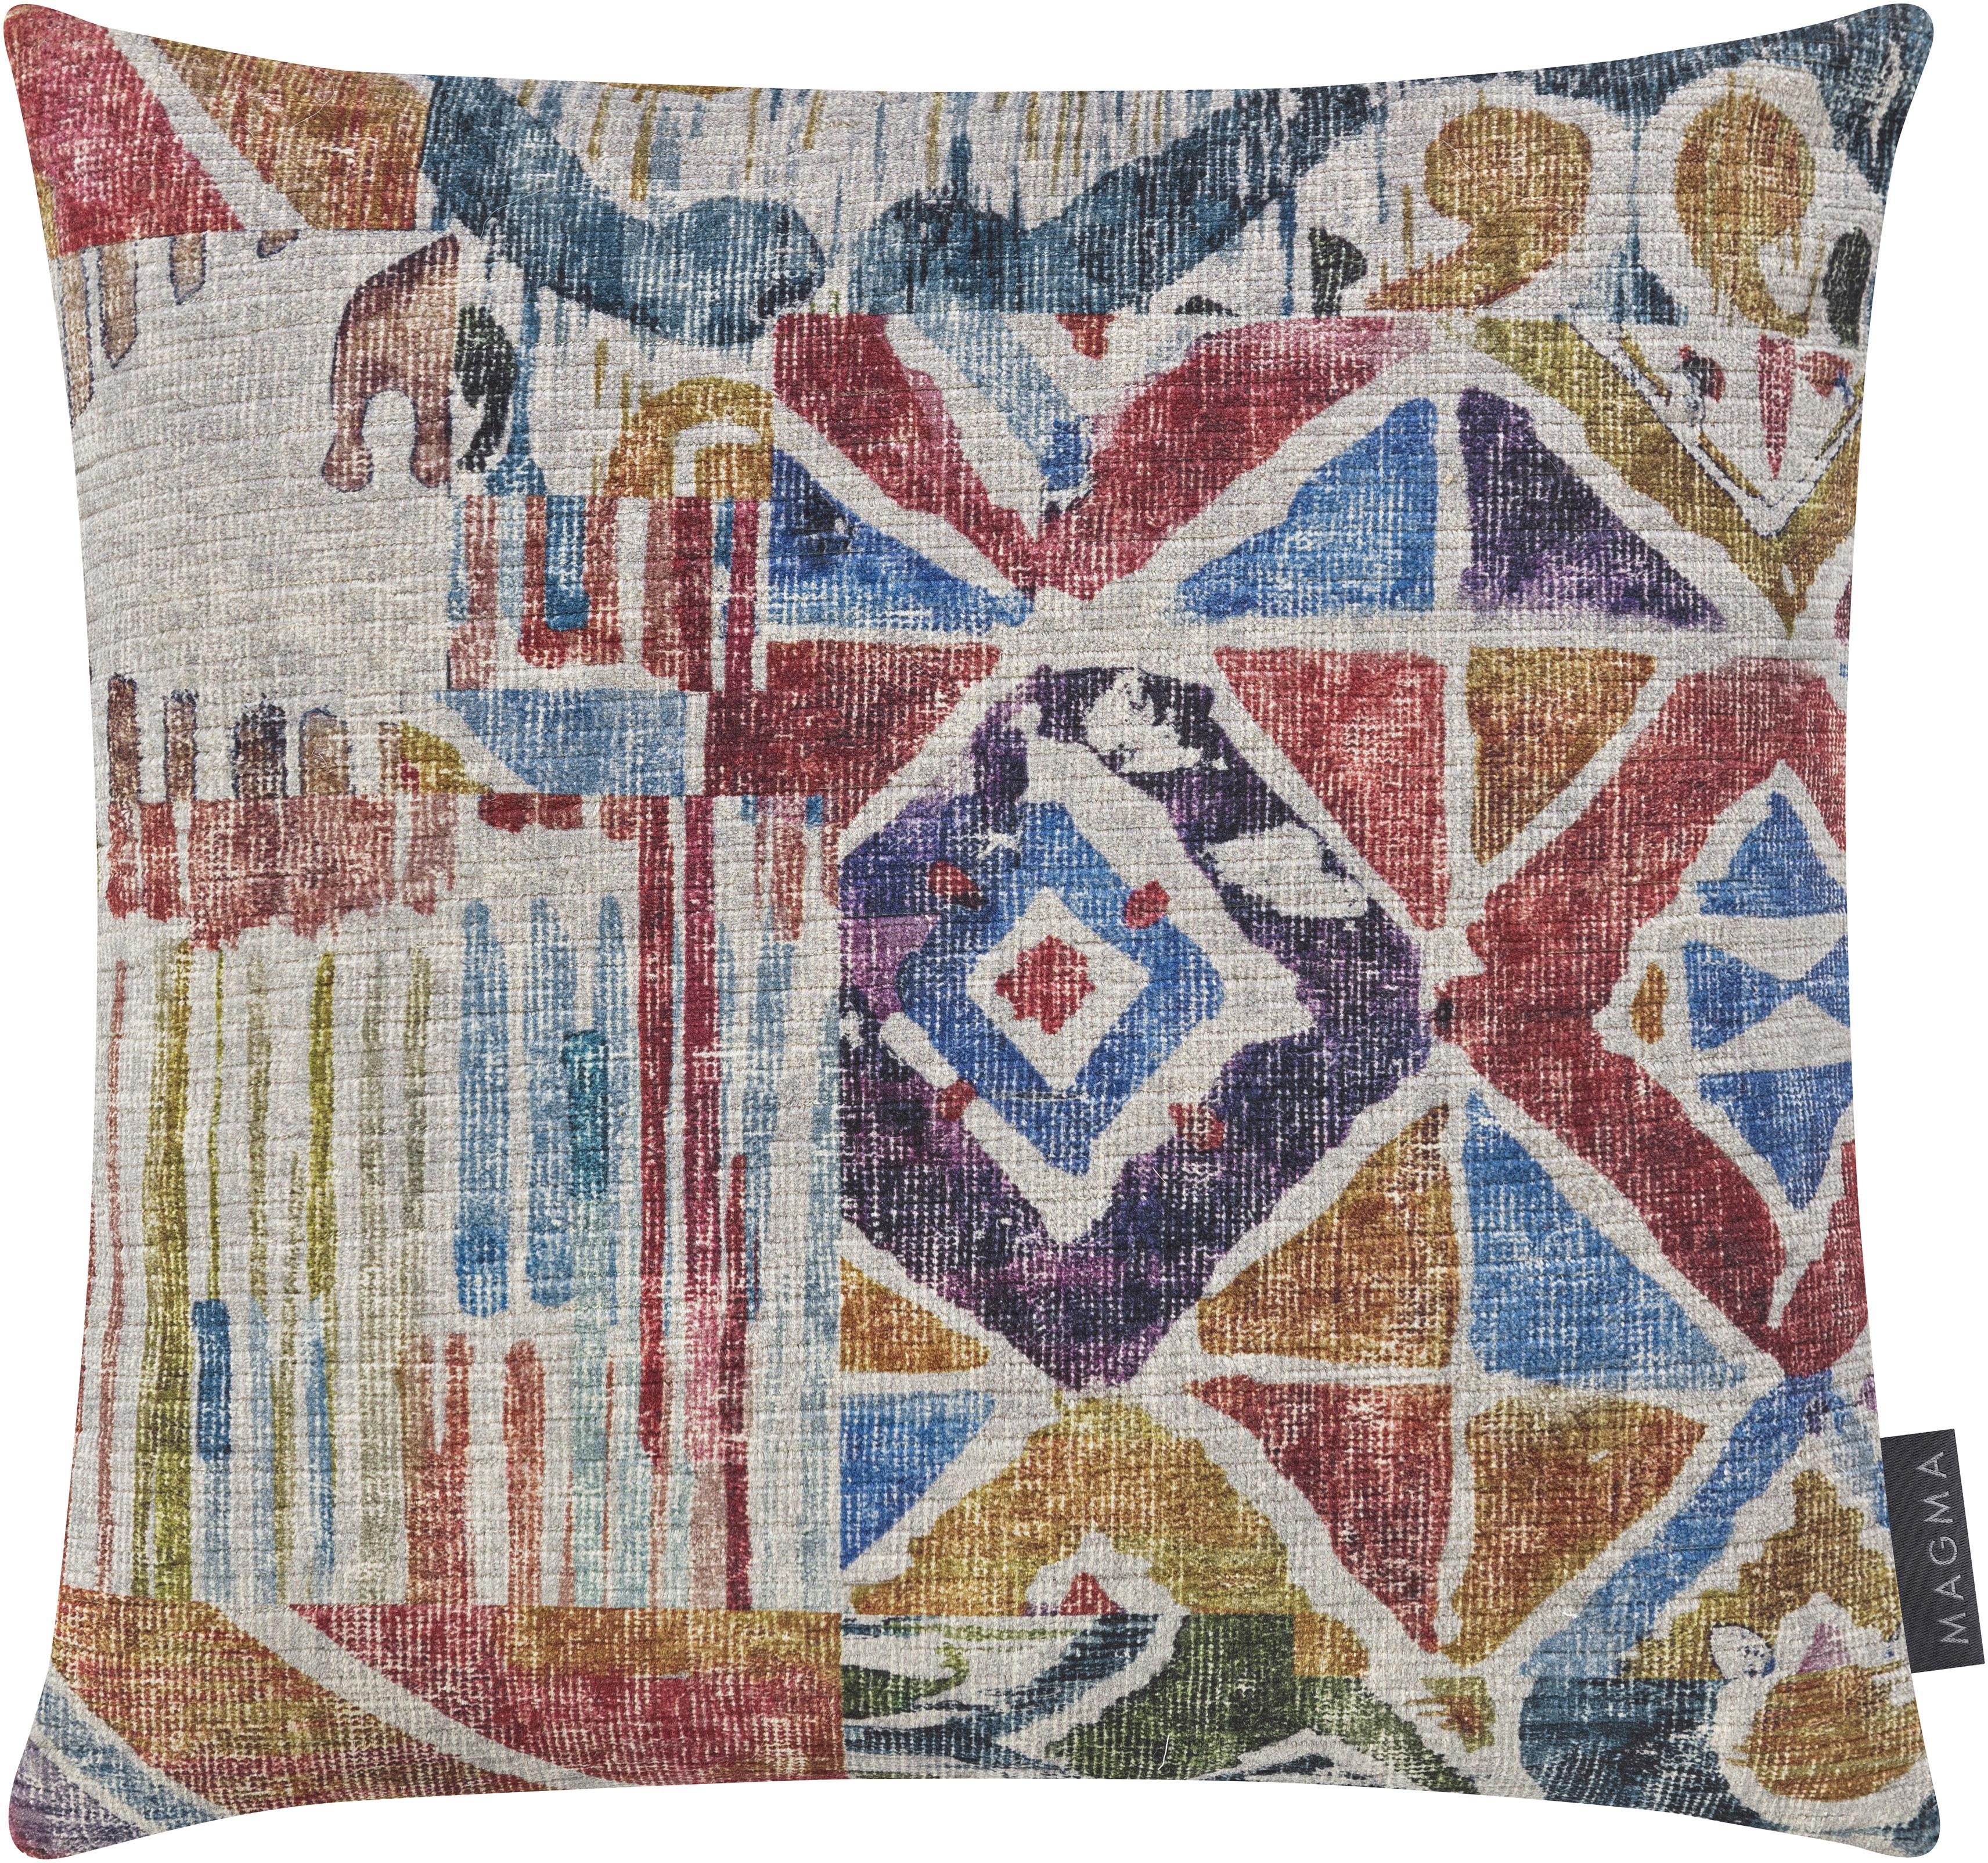 Fluwelen kussenhoes Cosima in kleur, Polyester fluweel, Wijnrood, multicolour, 40 x 40 cm